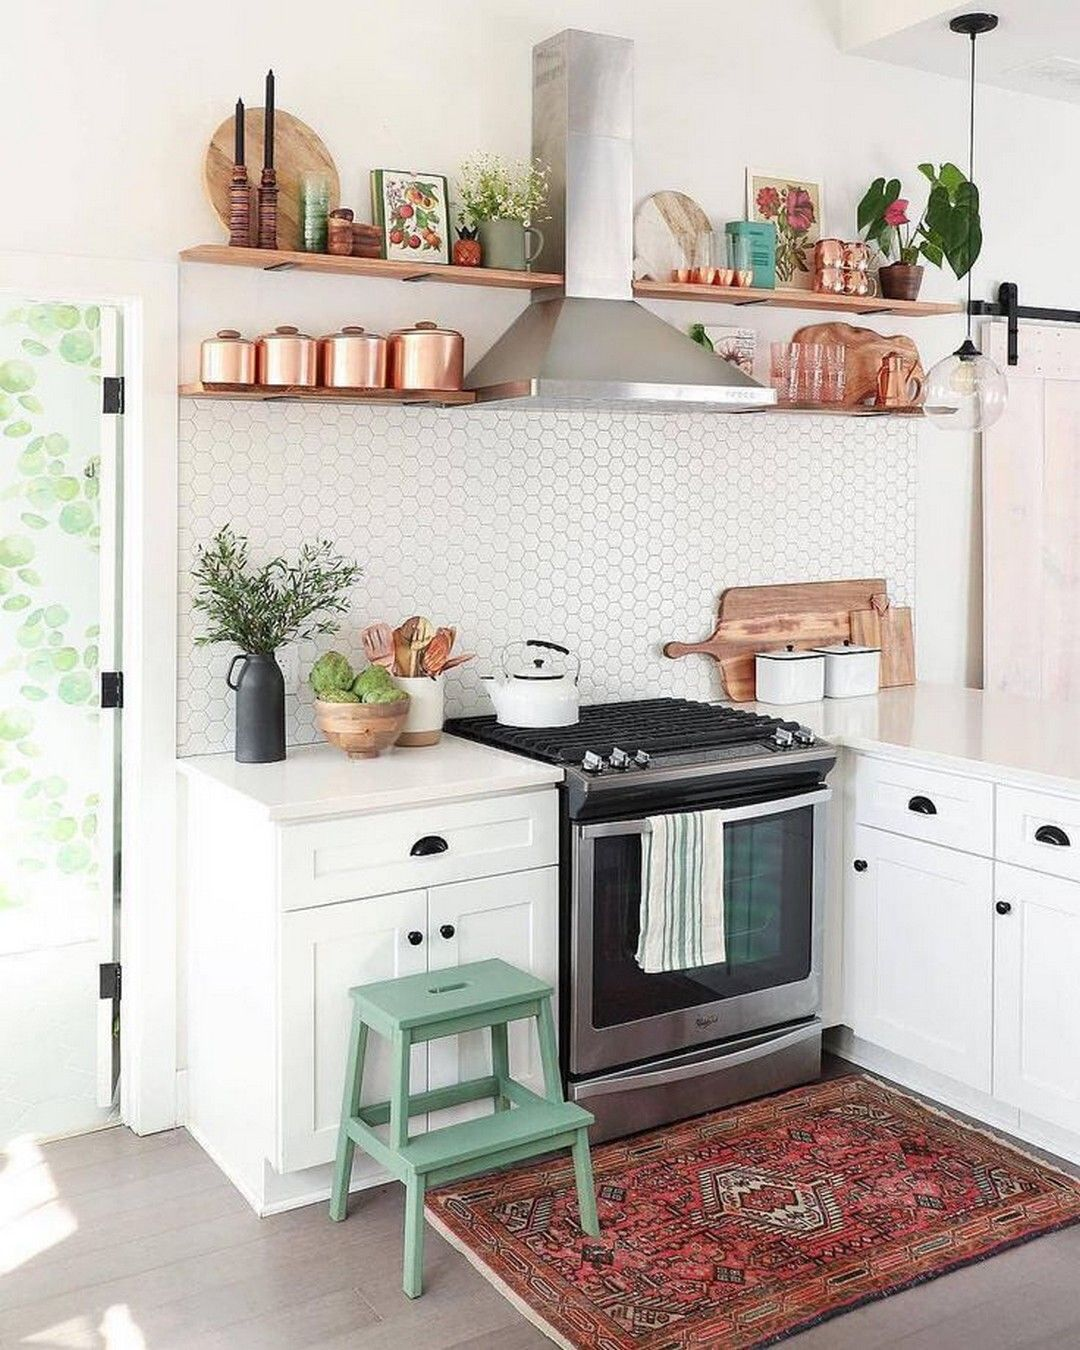 Best Small Kitchen Remodeling On Pinterest In 2020 Kitchen Remodel Small Kitchen Design Small Kitchen Hacks Design